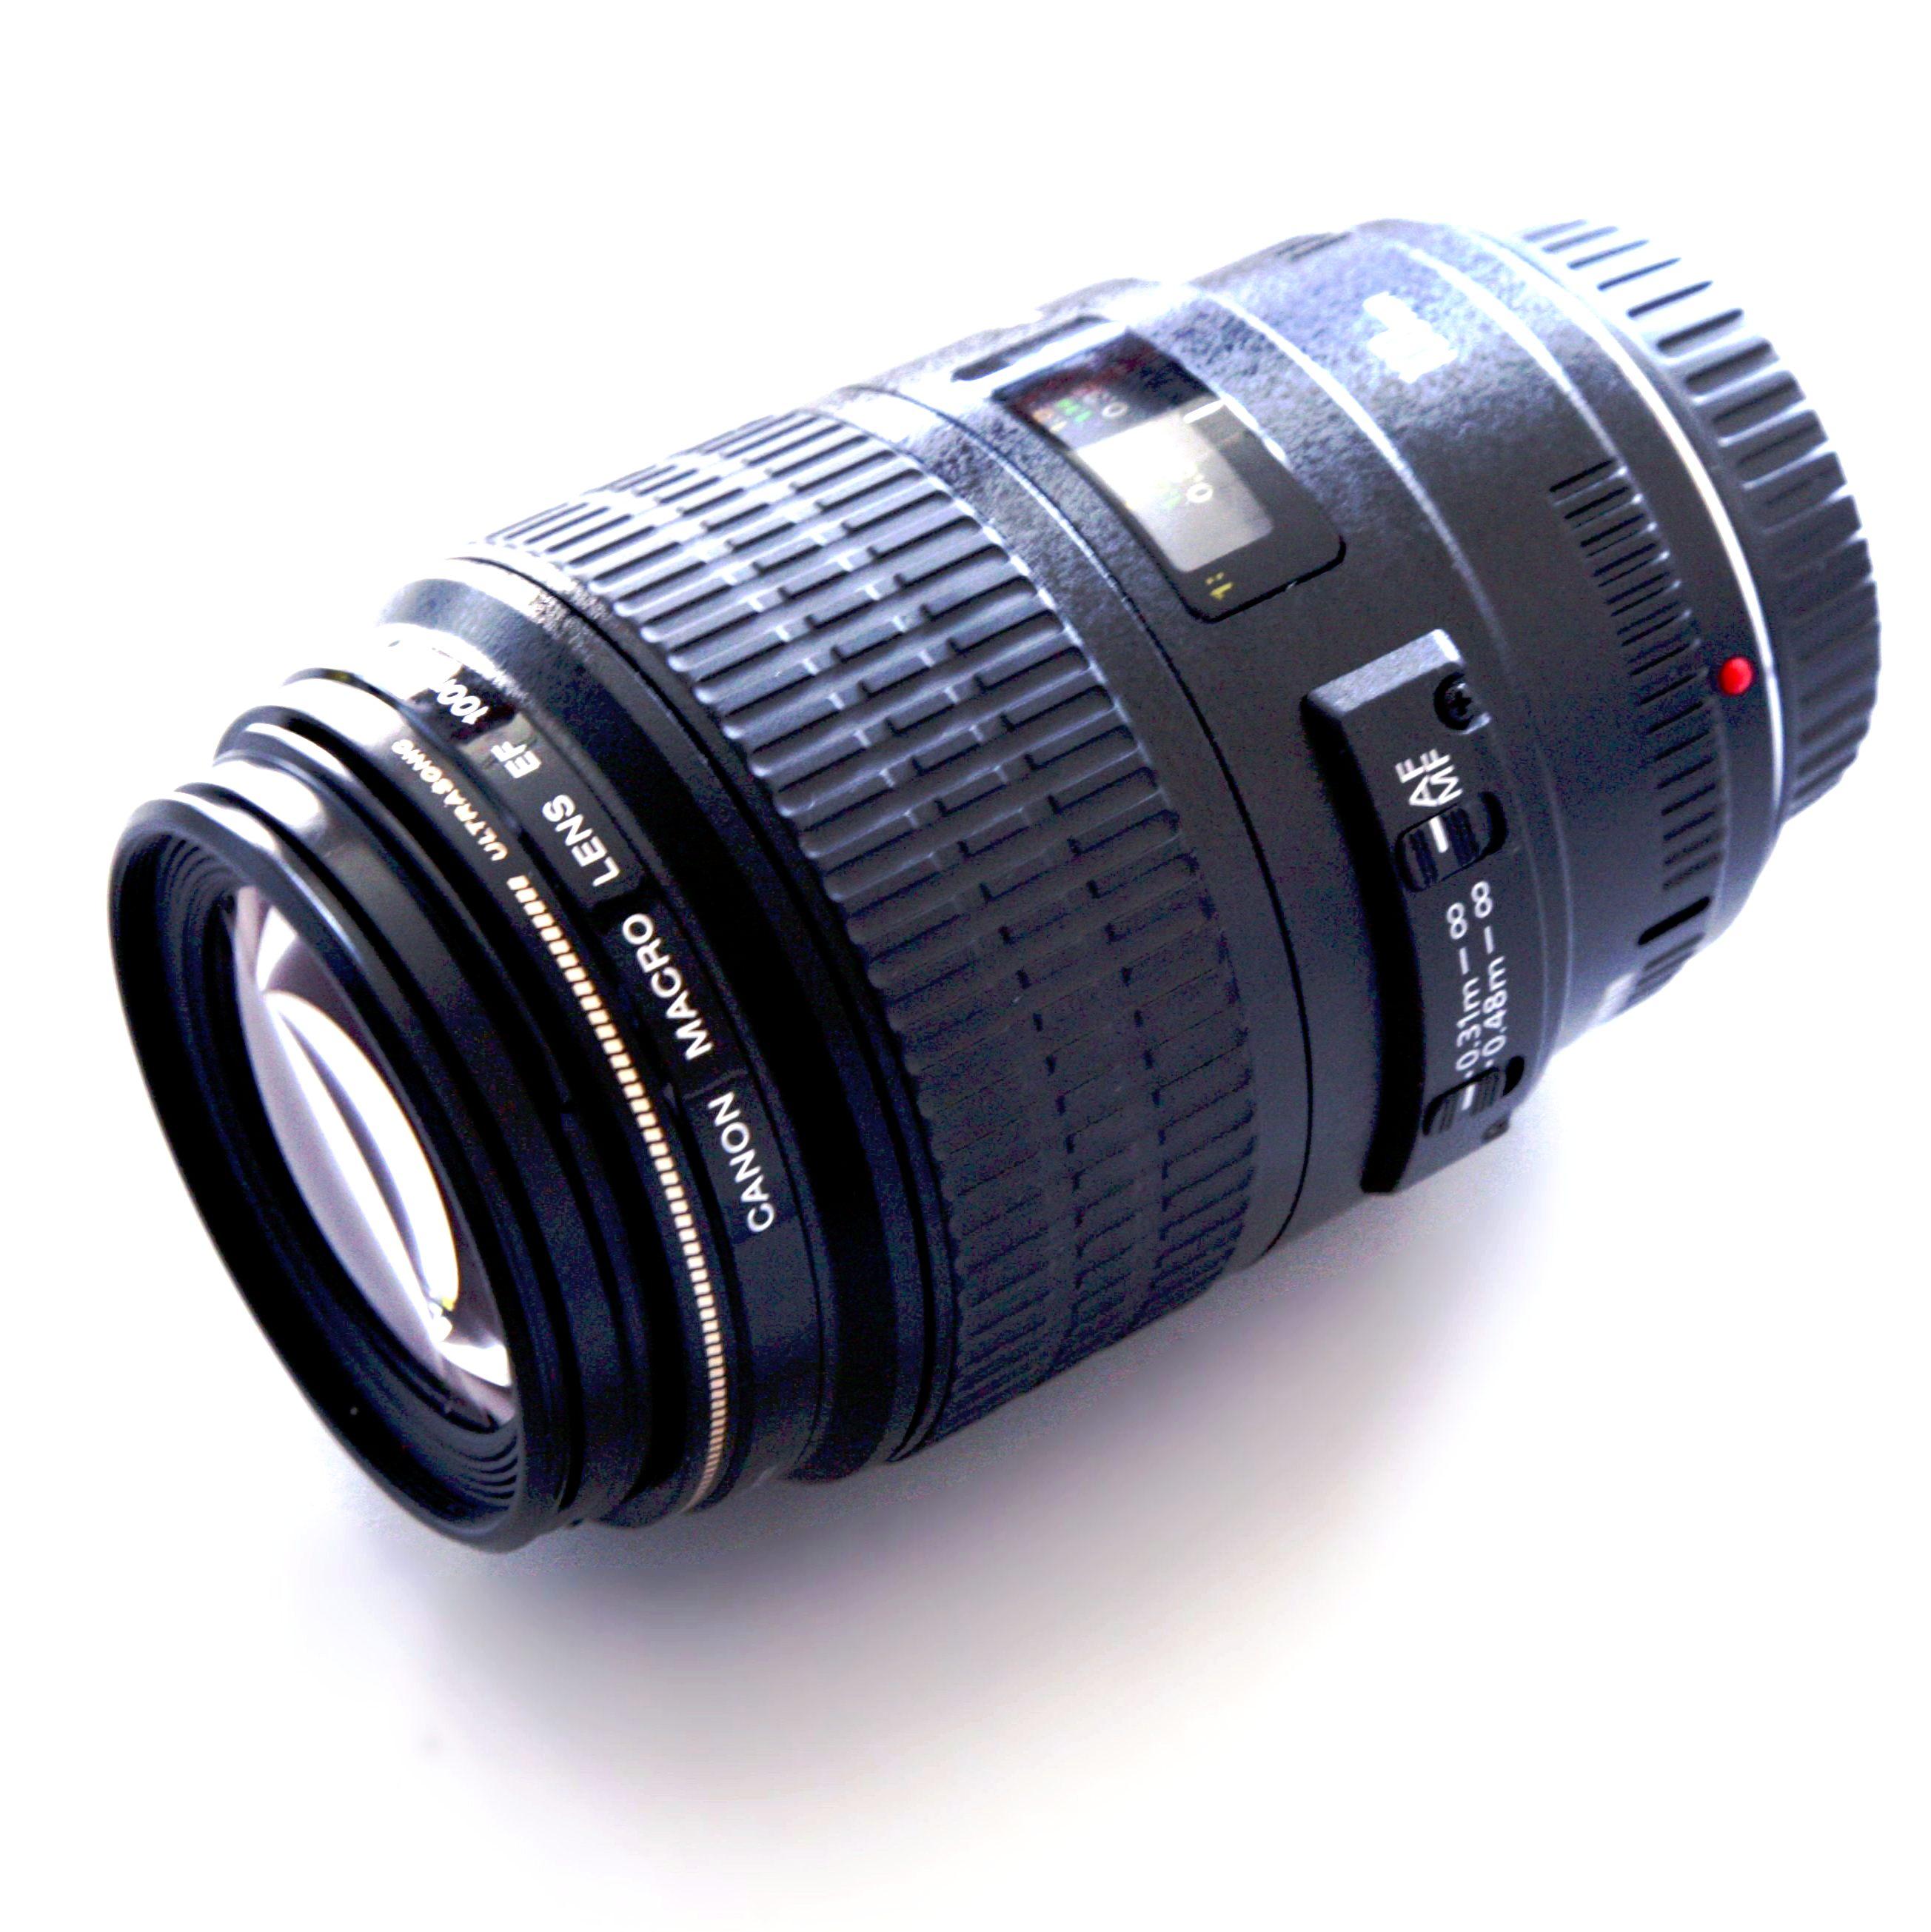 File:Canon 100mm Macro MG 1959.JPG